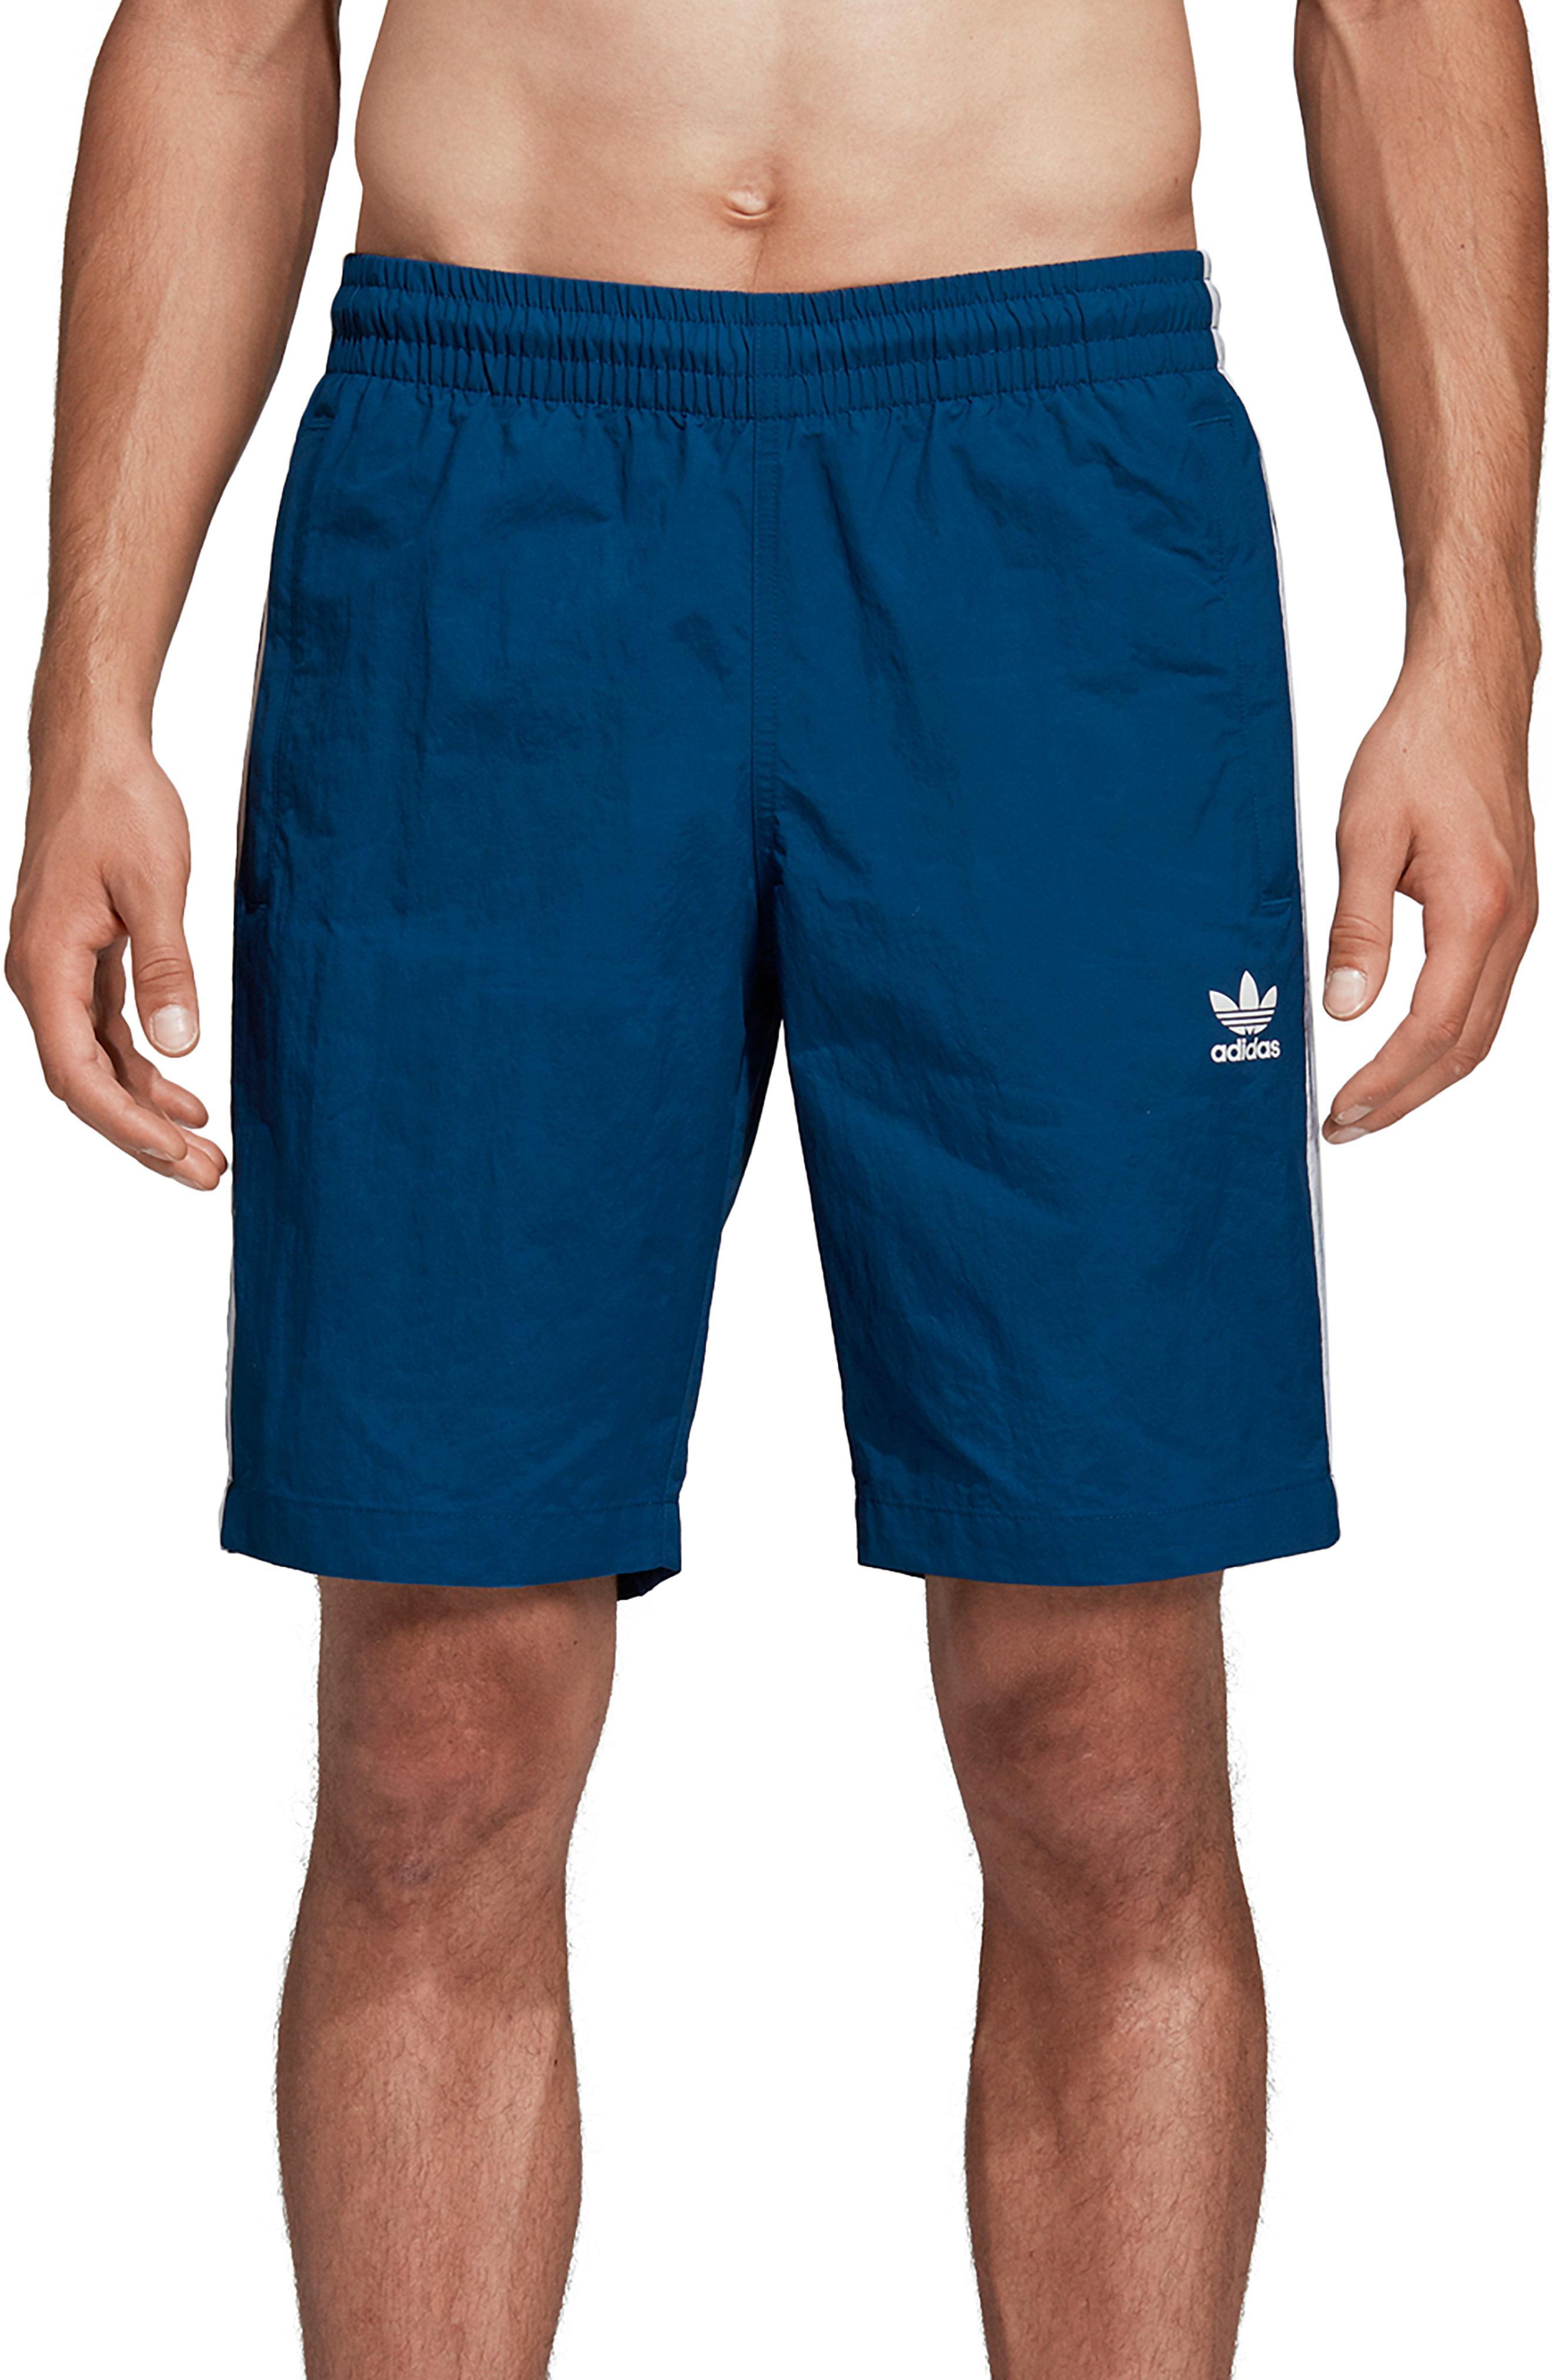 8945a68641 Lyst - adidas Originals 3-stripes Swim Trunks in Black for Men